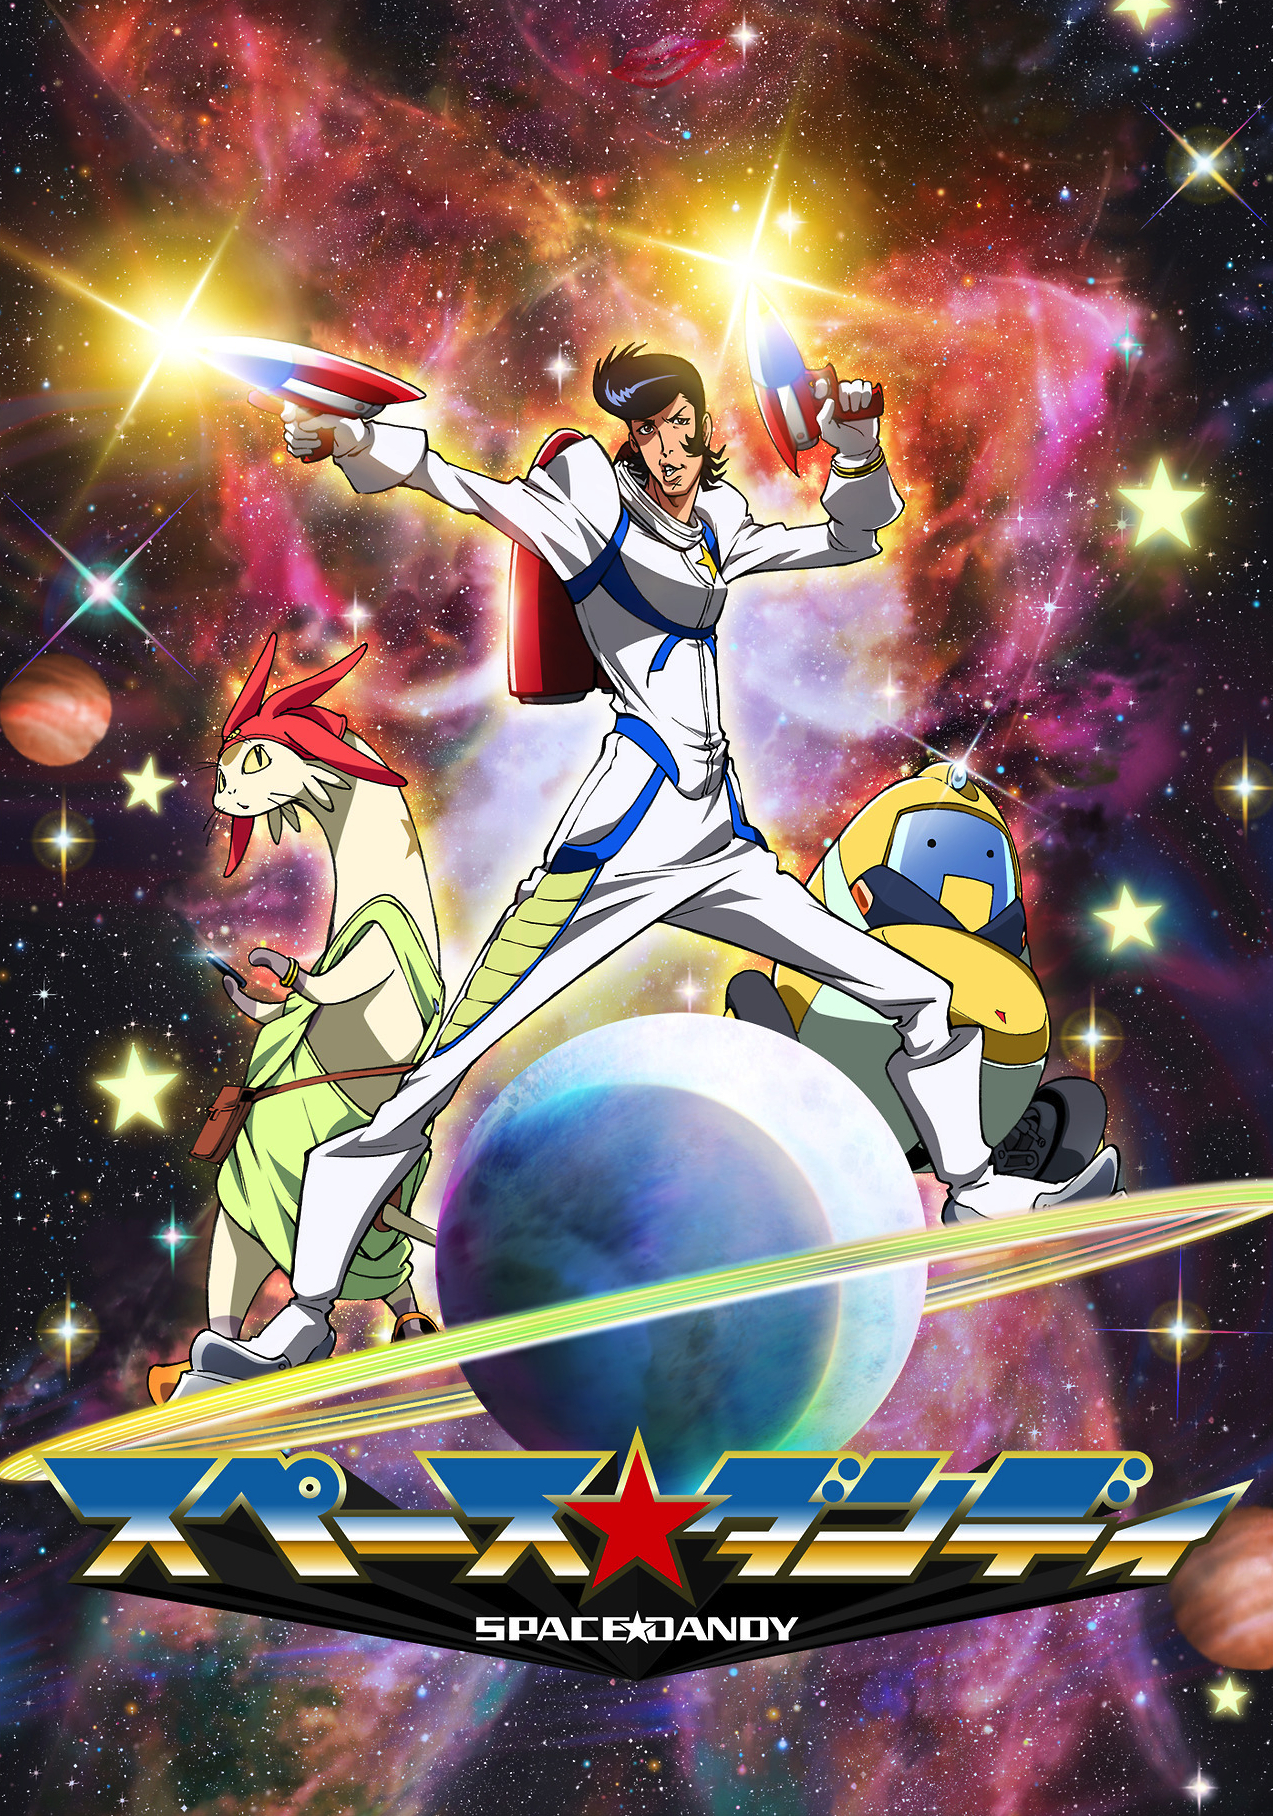 Space dandy episode list